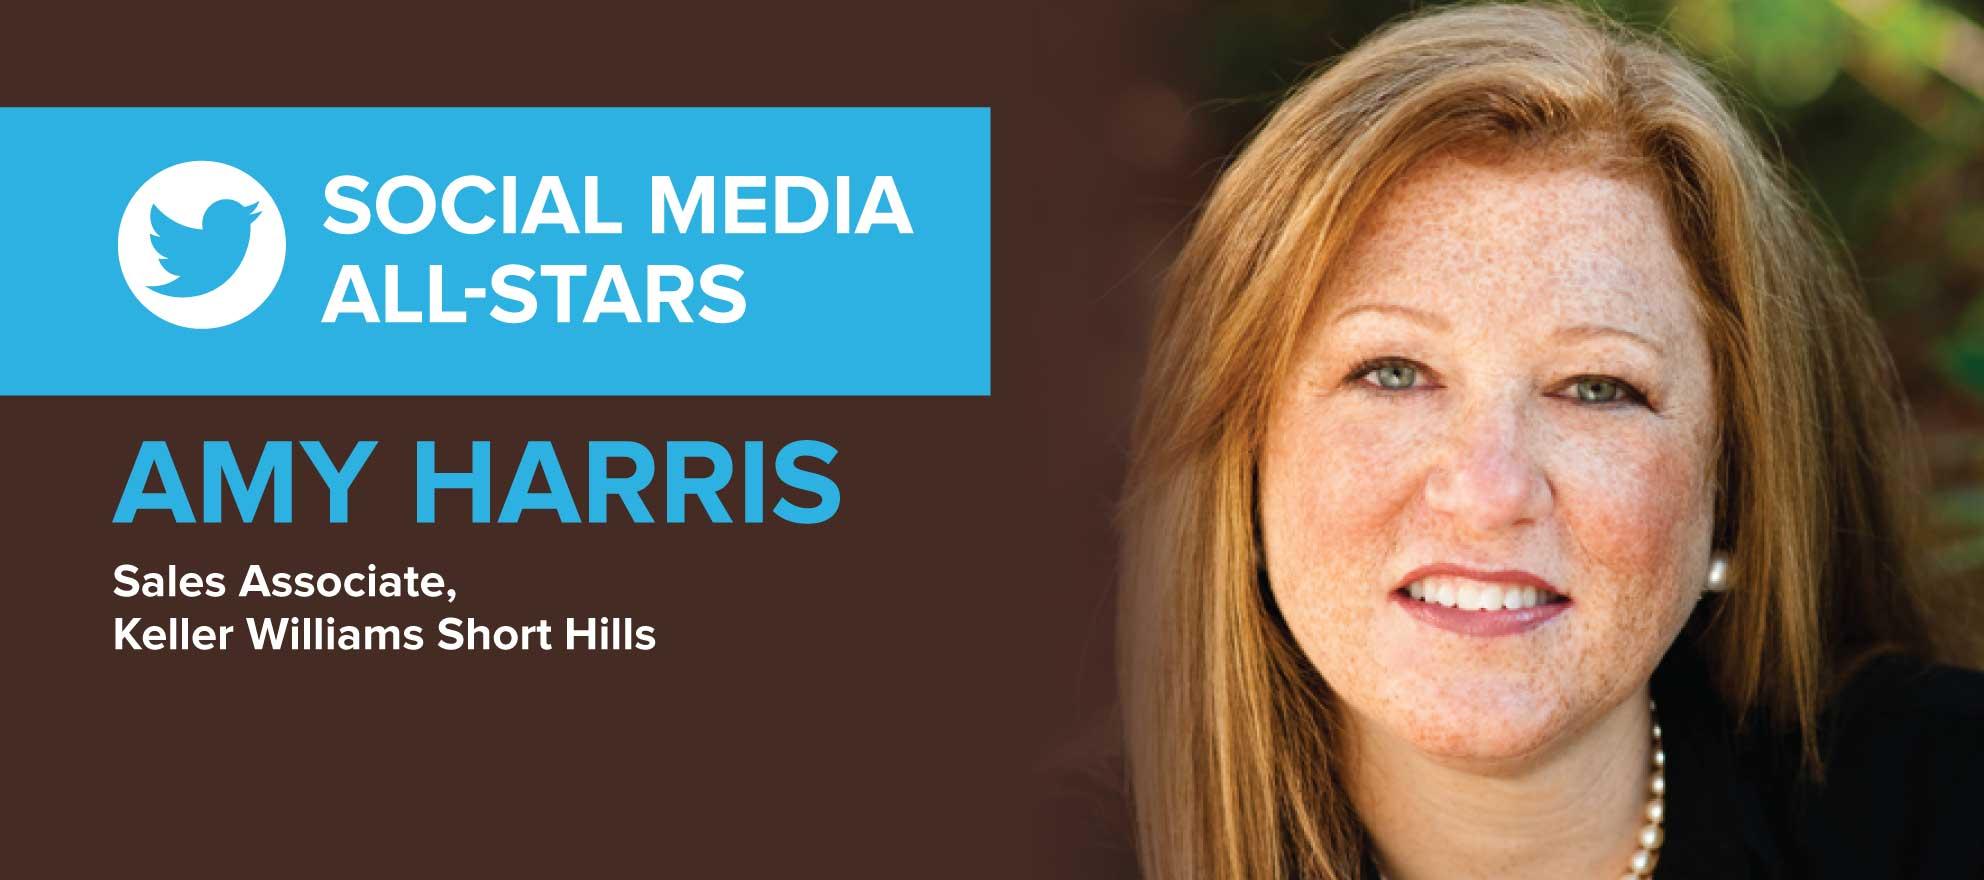 Amy Harris: 'Social media gives my brand a big reach'